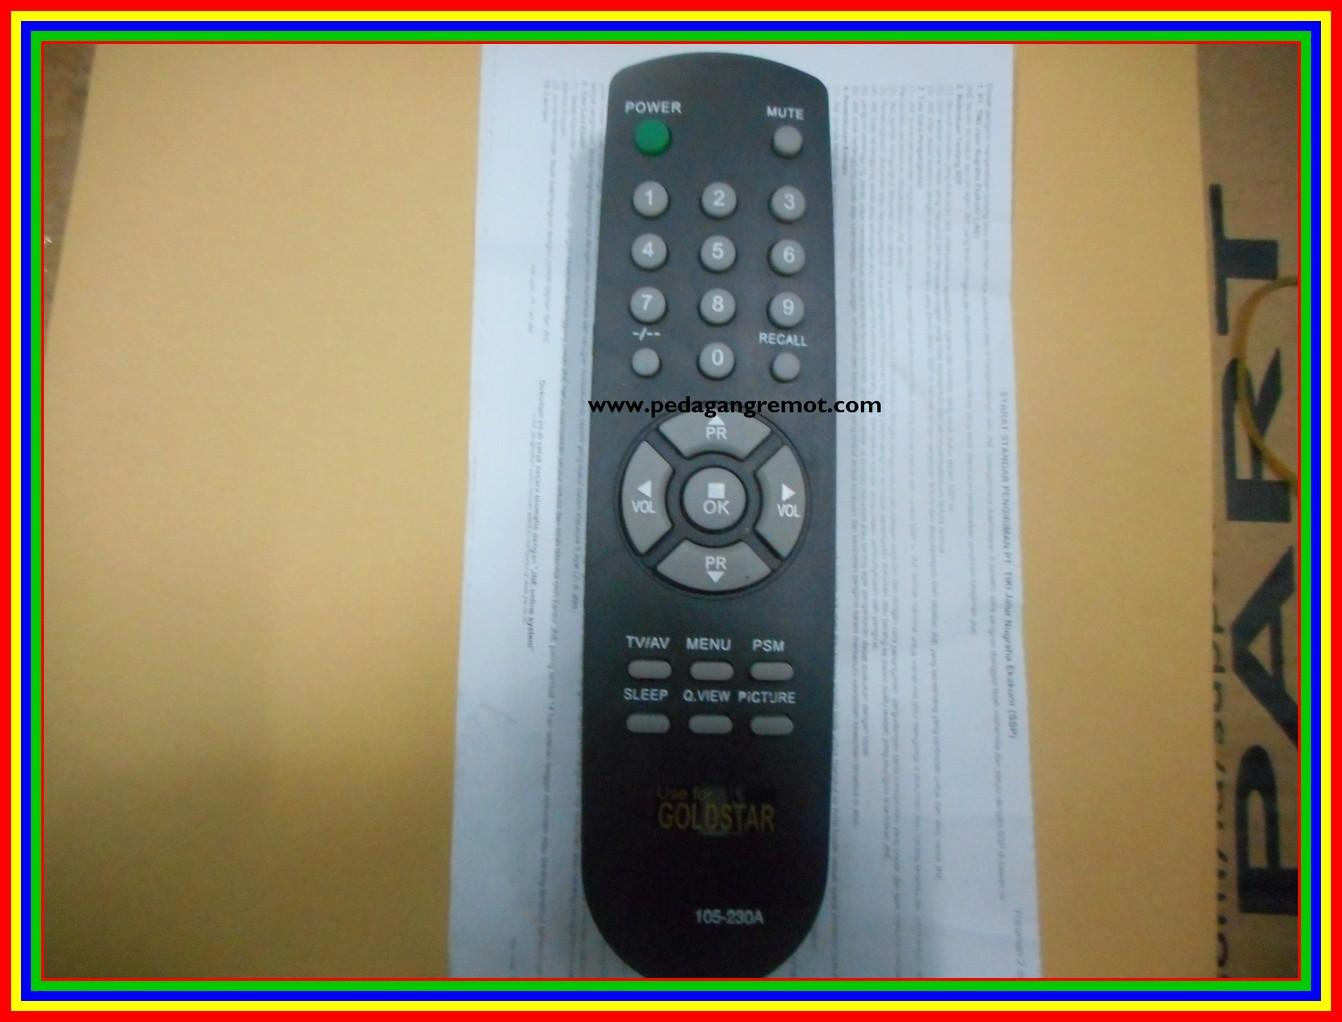 Eelic Sor 40w5 Biru Solder Profesional Sangat Bagus Daftar Harga Source · Remot Remote TV Tabung Goldstar